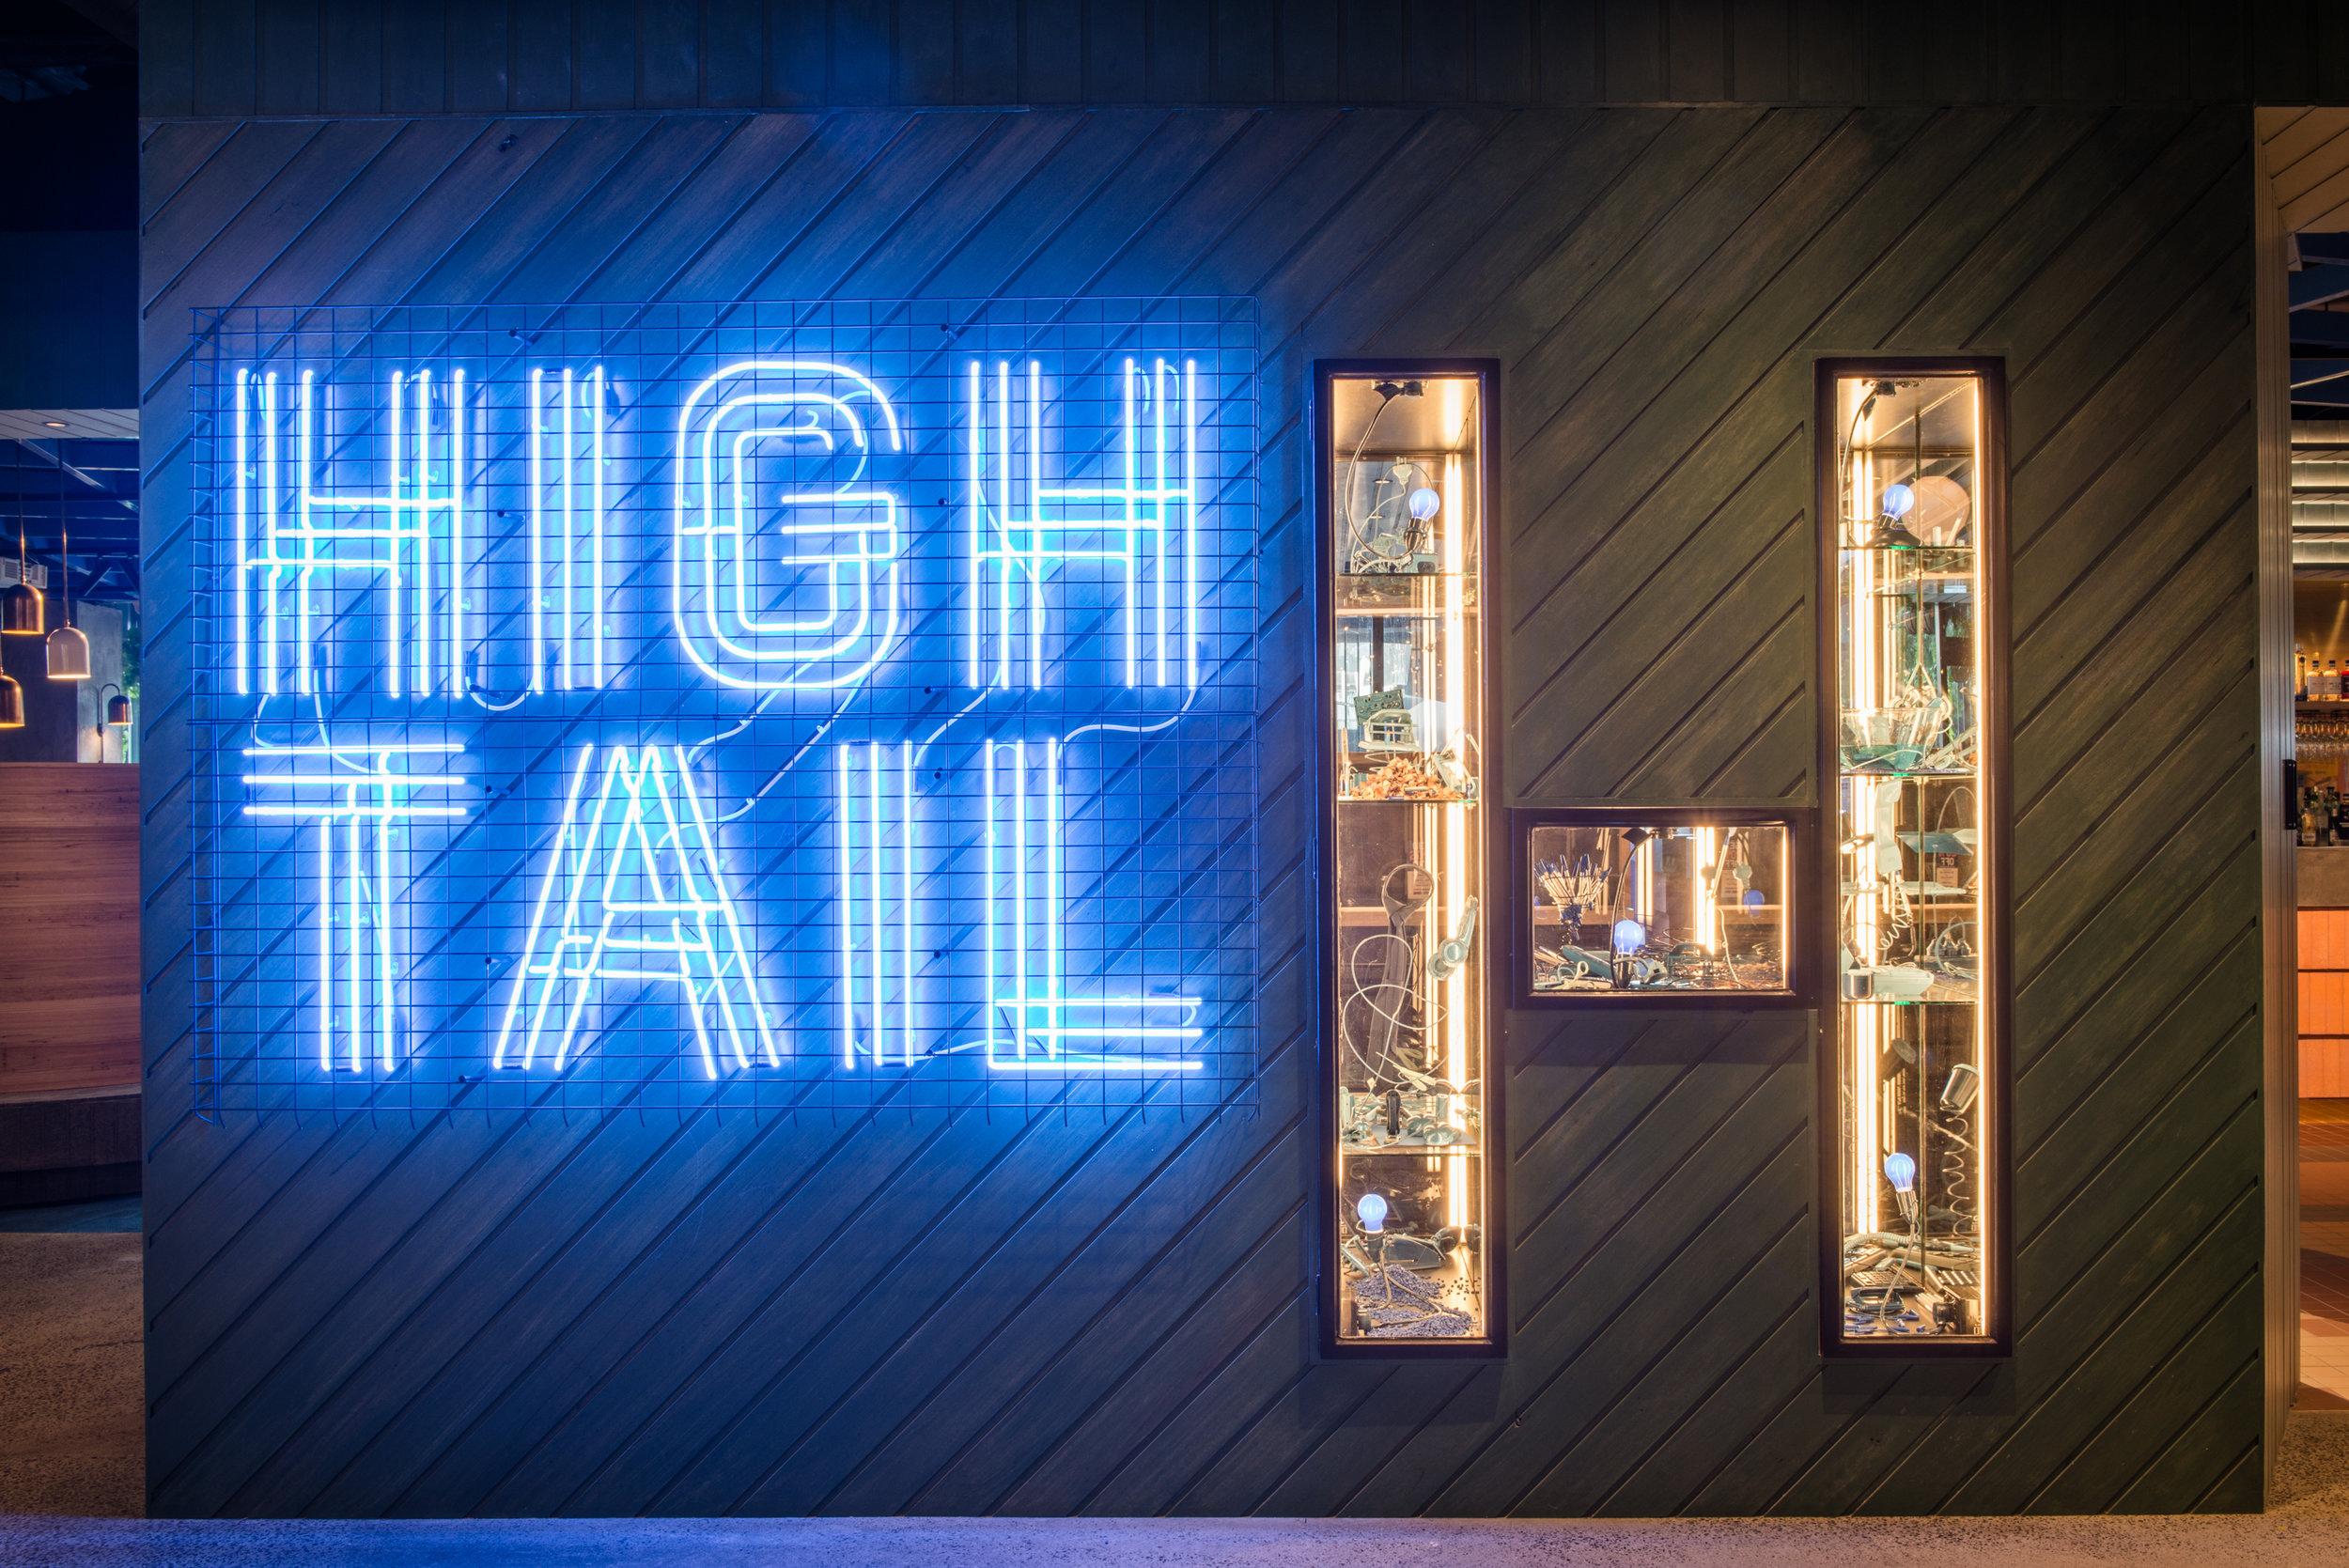 Hightail-20170721-DSC_0409.jpg